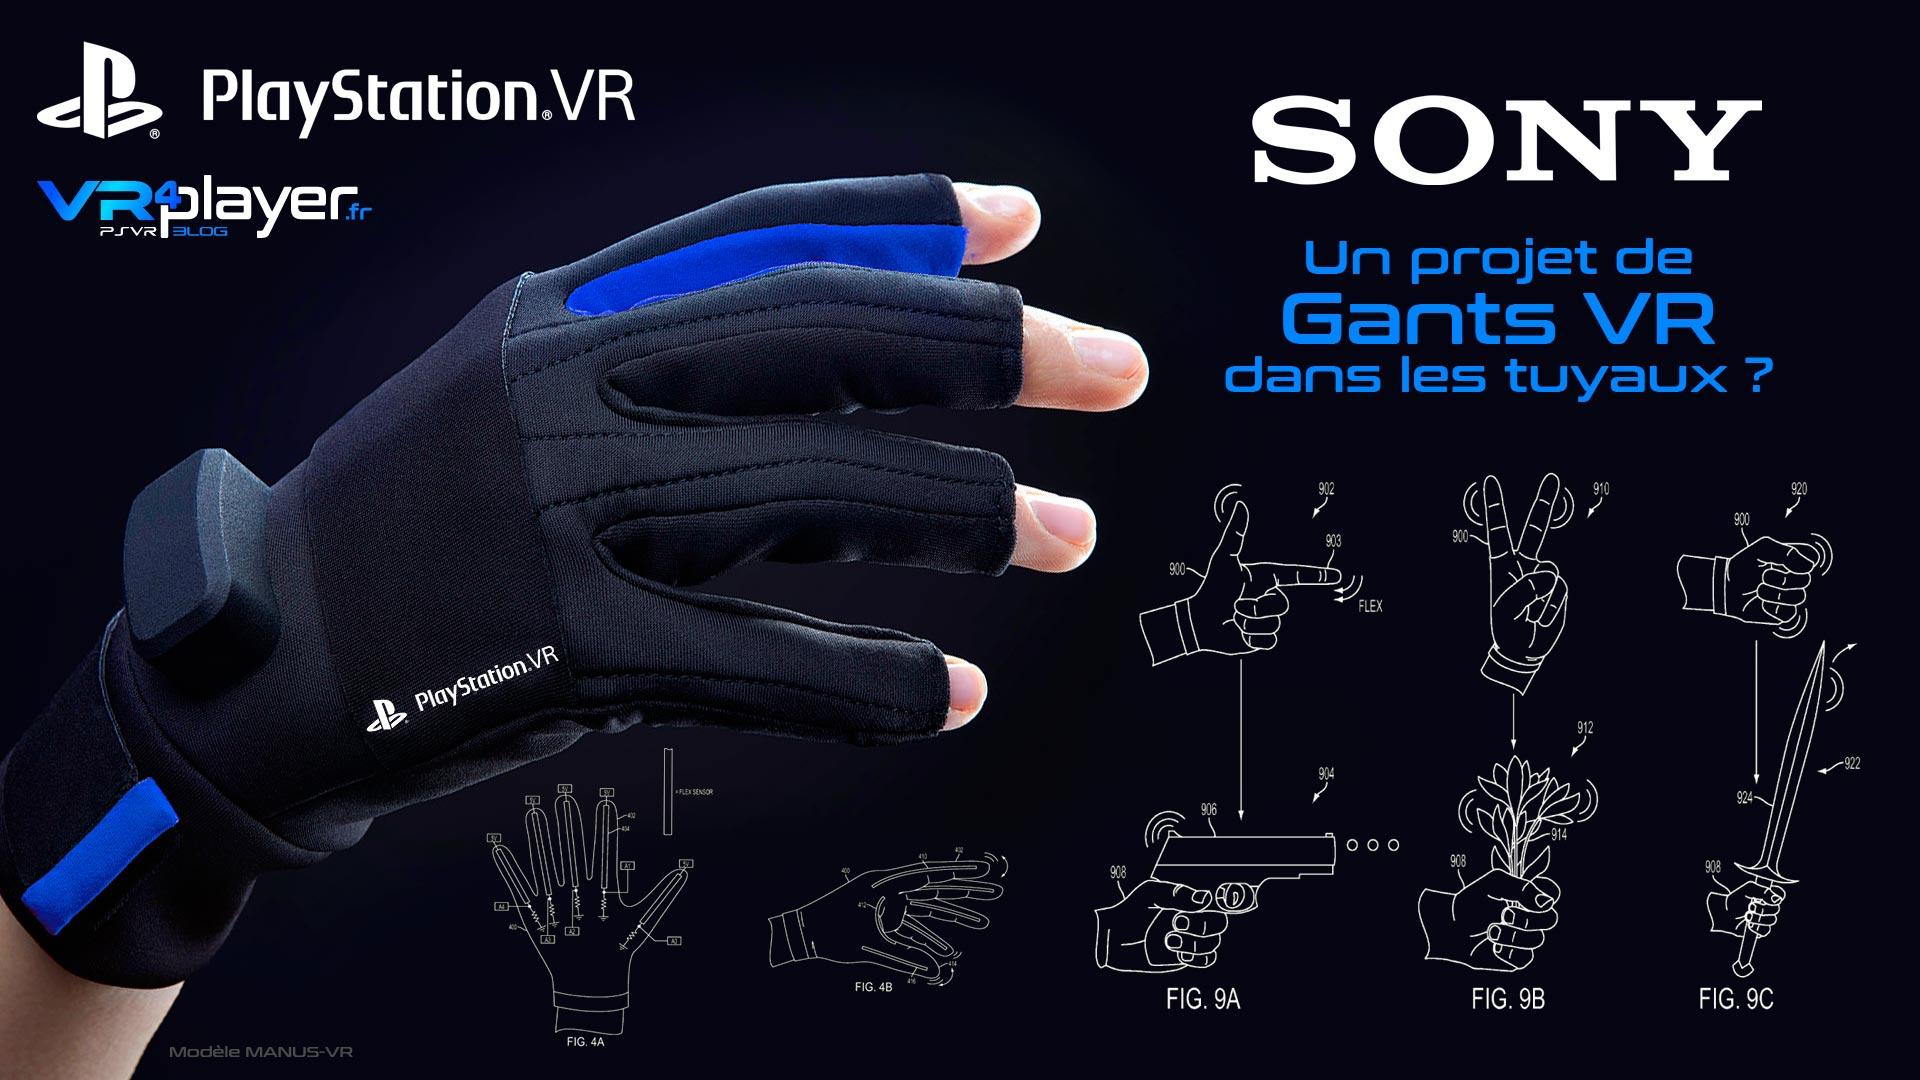 gants VR PlayStation VR VR4player